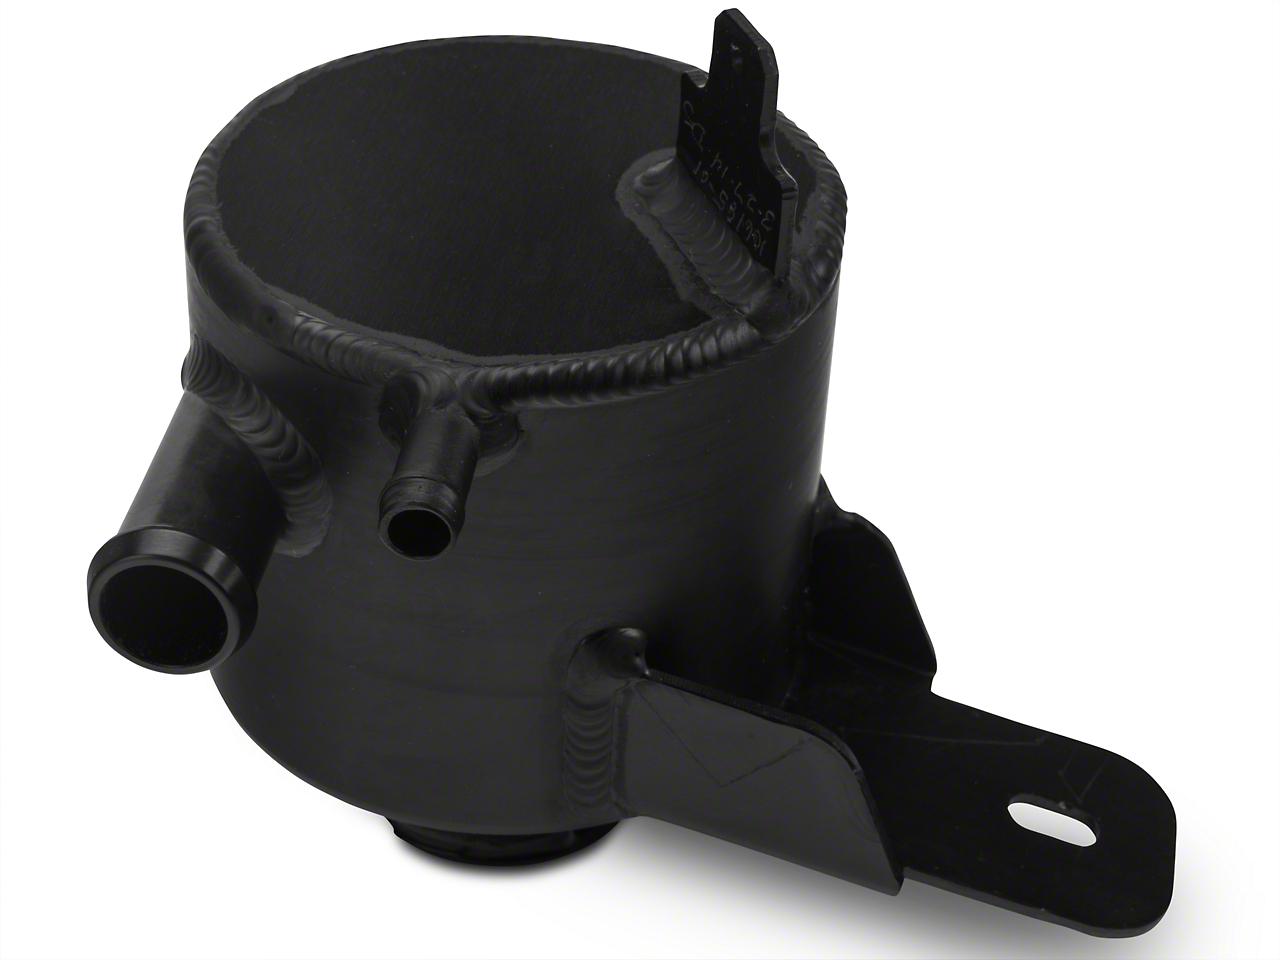 C&R Racing Aluminum Power Steering Reservoir - Black (05-10 GT, GT500)